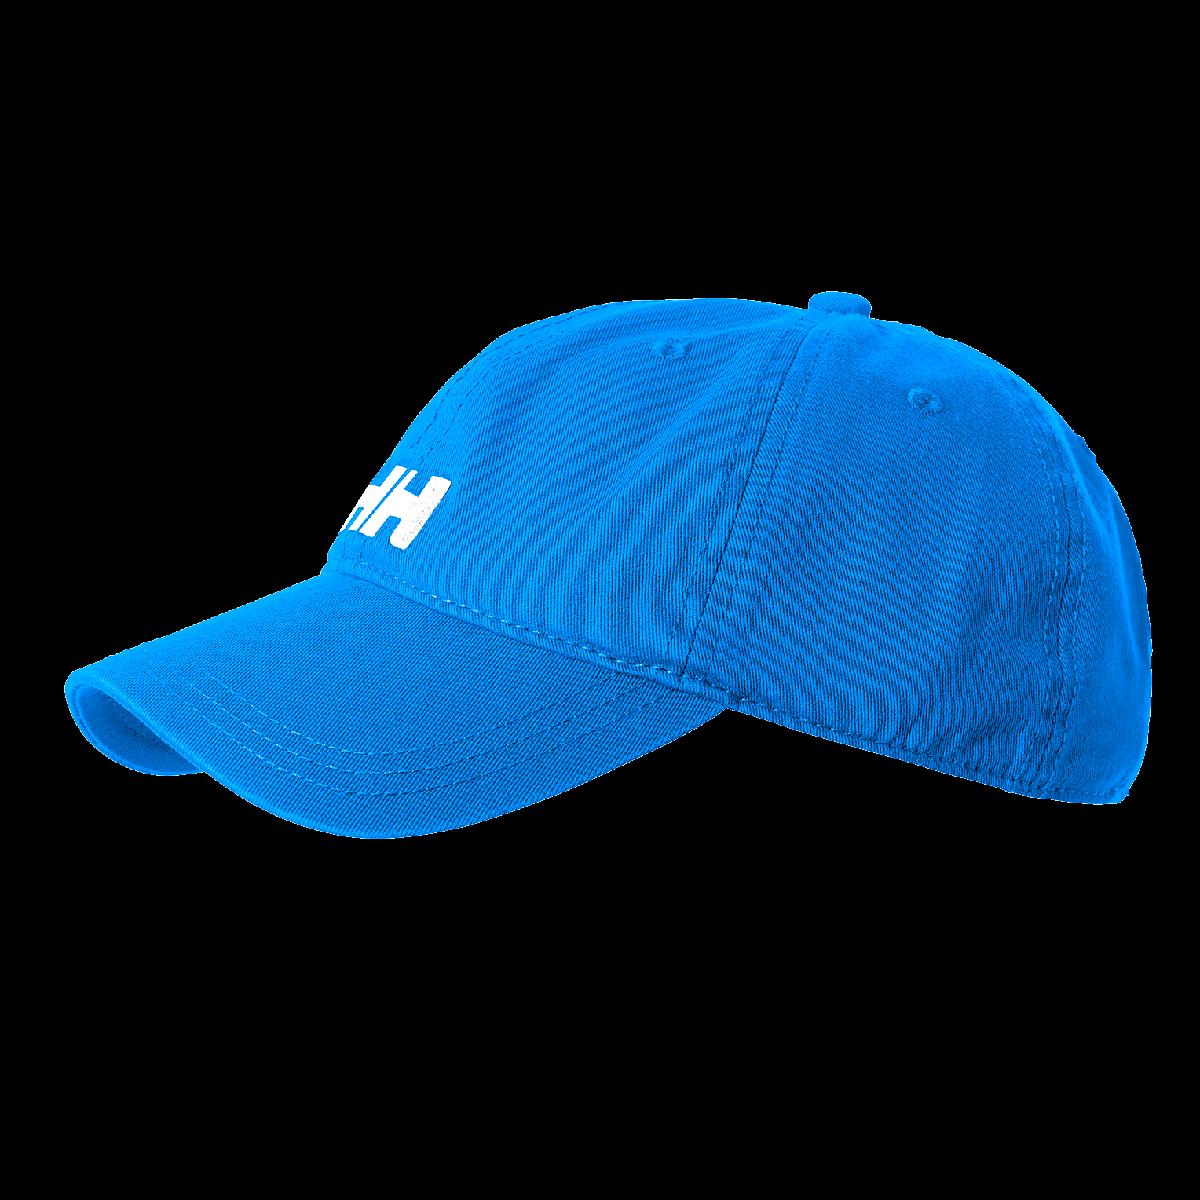 HELLY HANSEN LOGO CAP (38791)